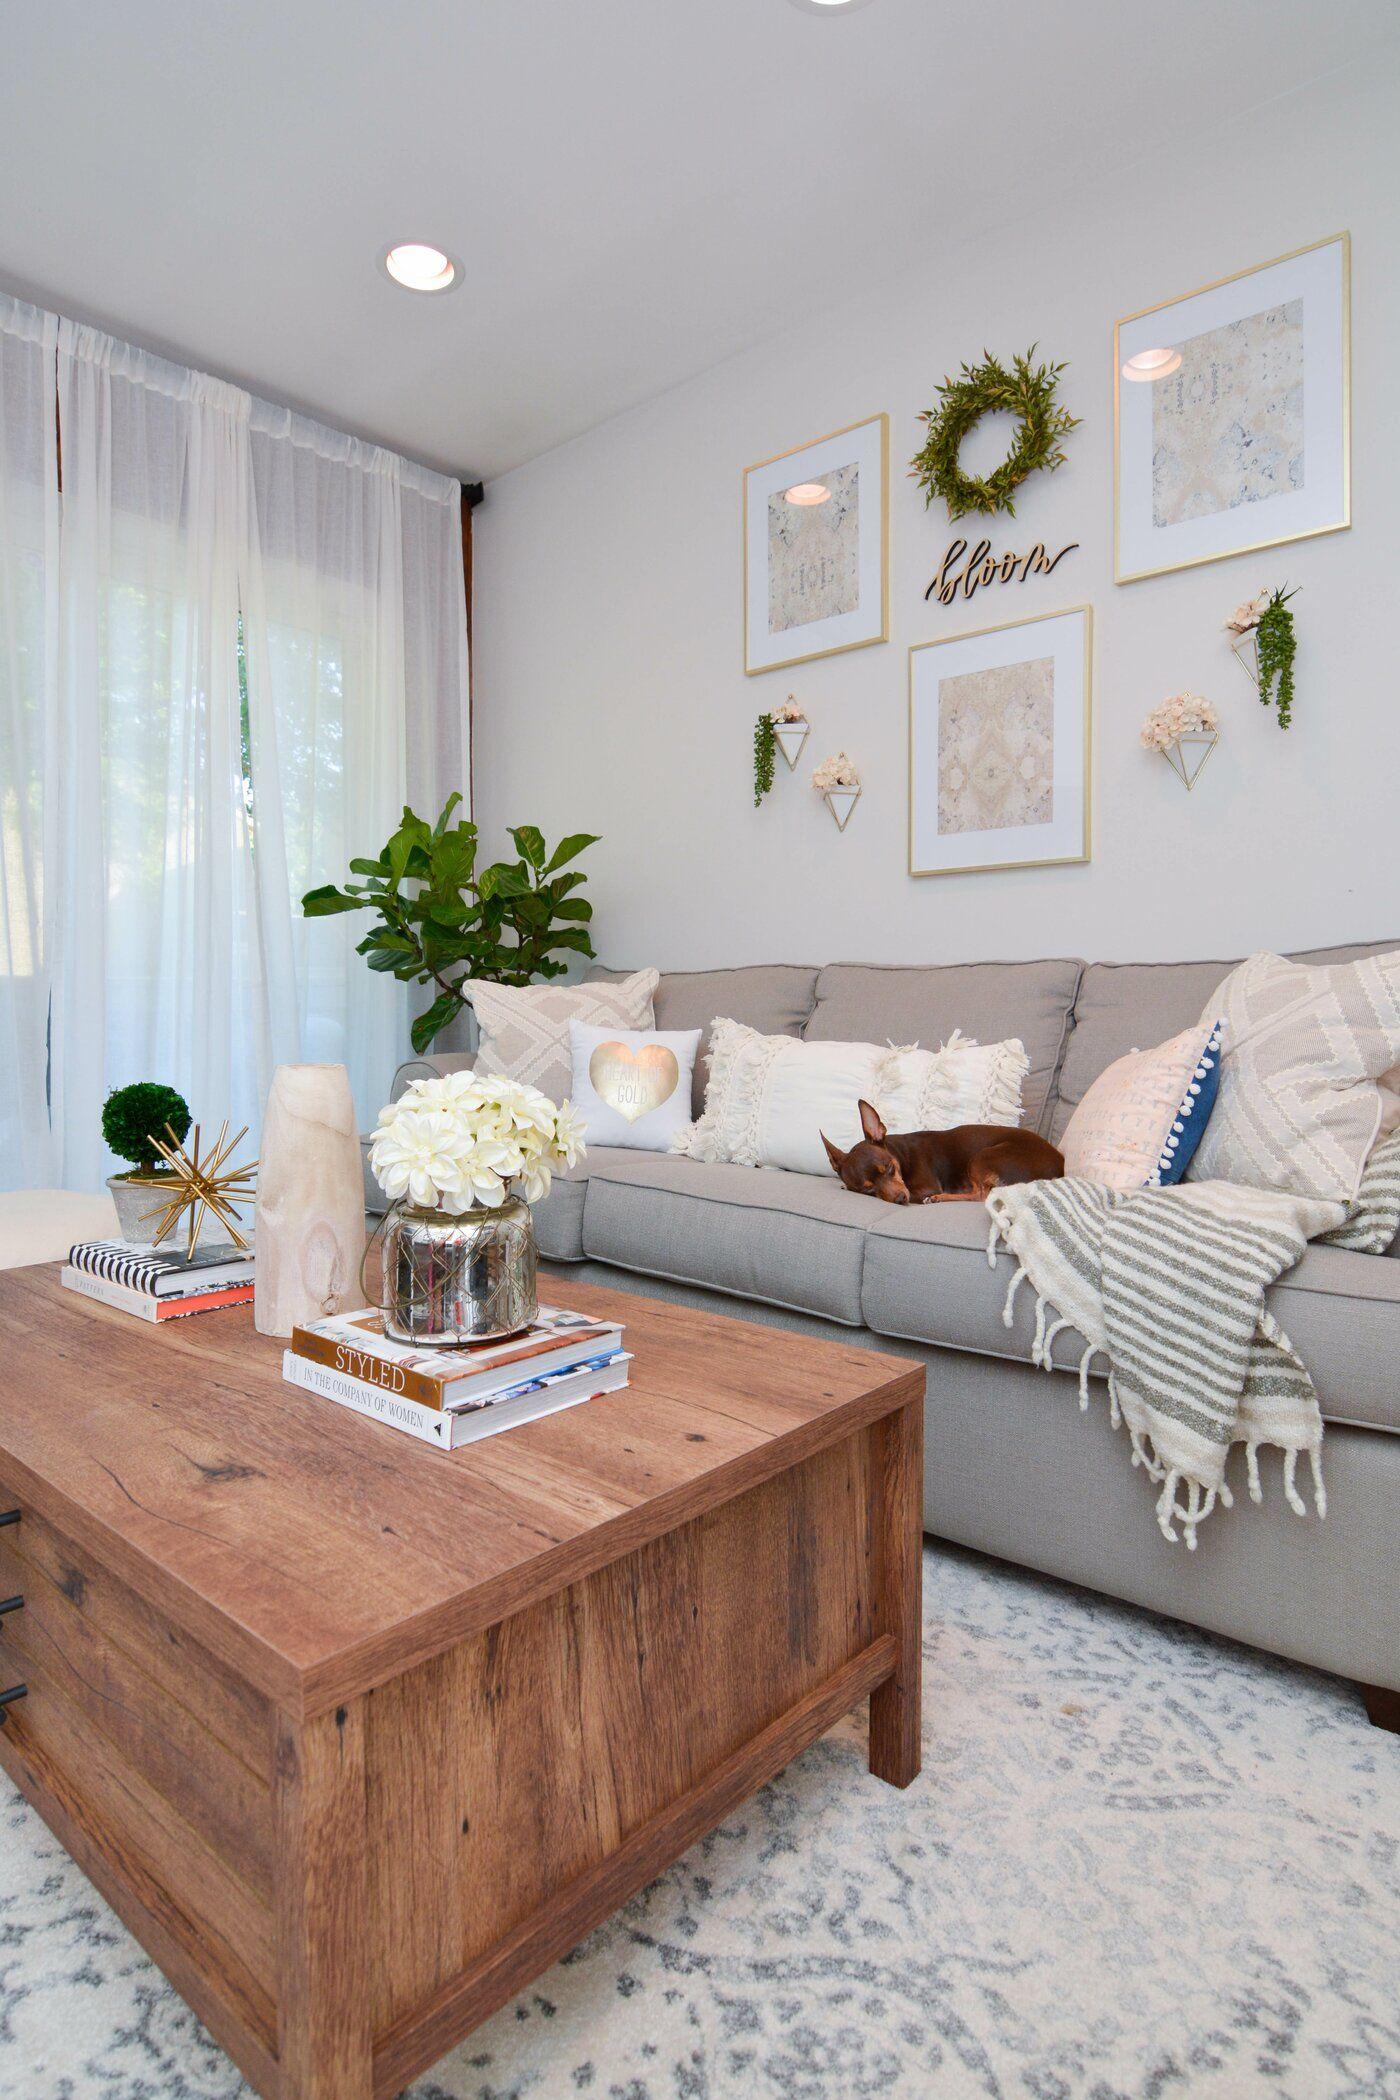 Wayfair Arrighetto Sofa Bed Sleeper: Arrighetto Sofa Bed Sleeper In 2019